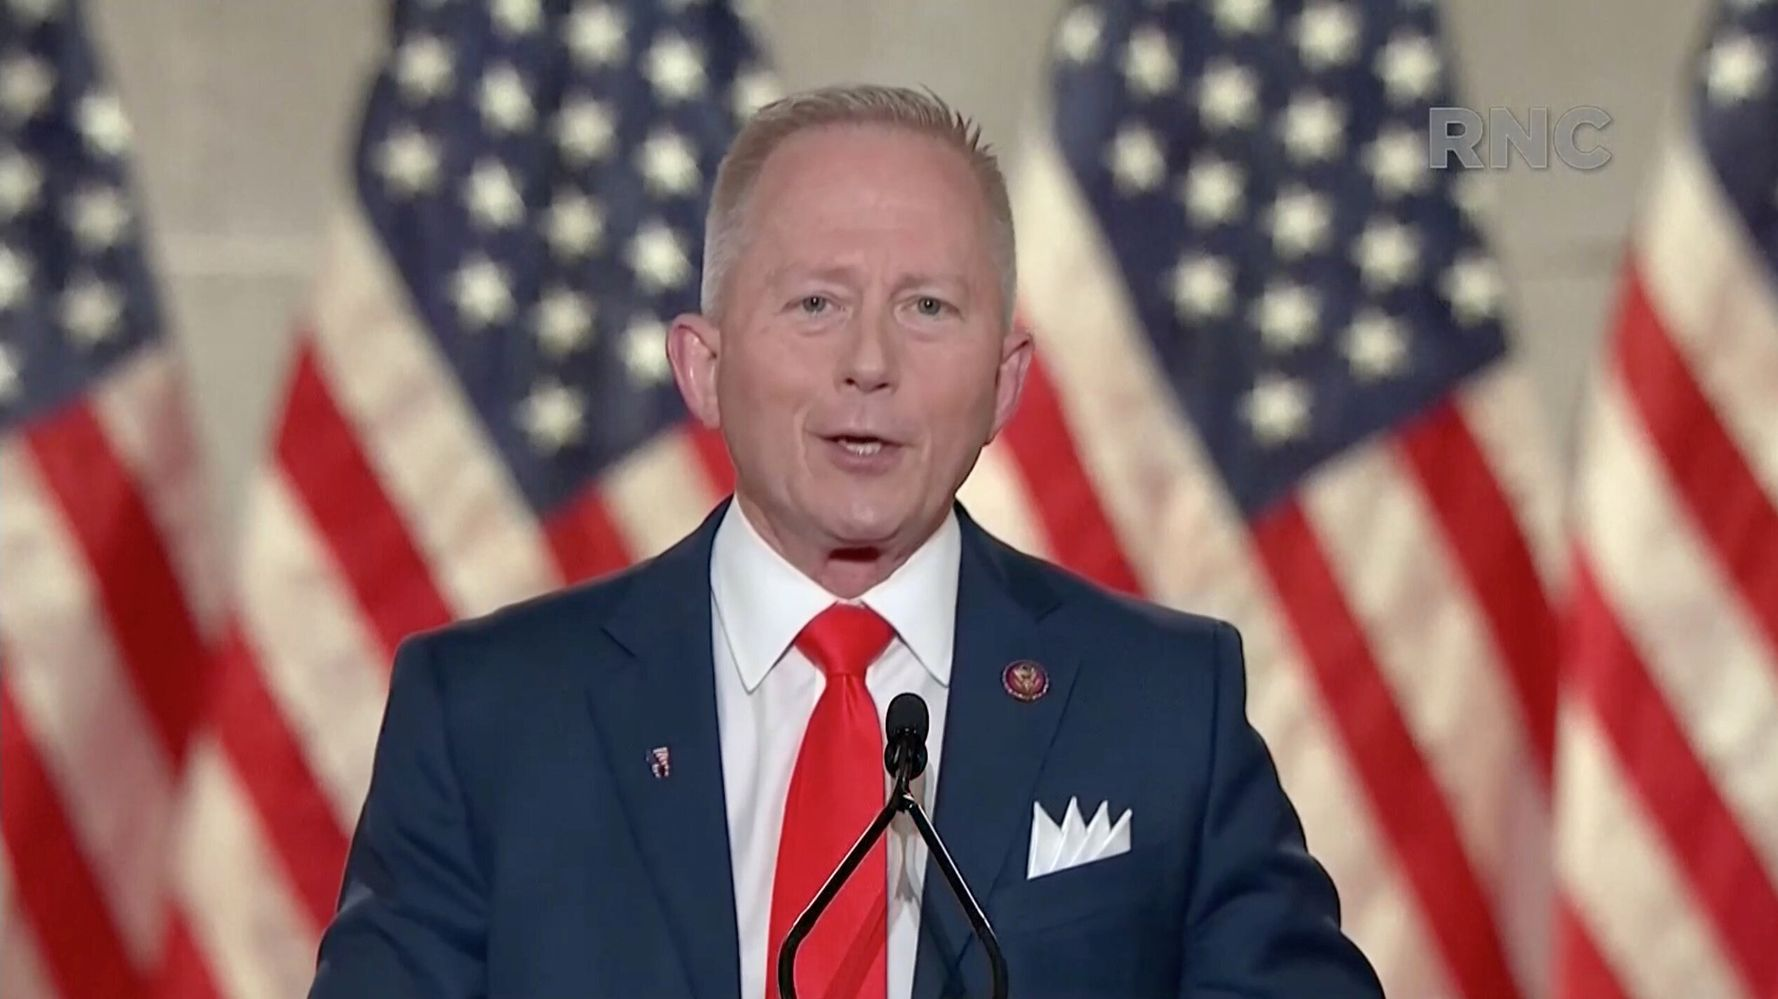 Jeff Van Drew, A Democrat-Turned-Republican, Wins Reelection In New Jersey House Race